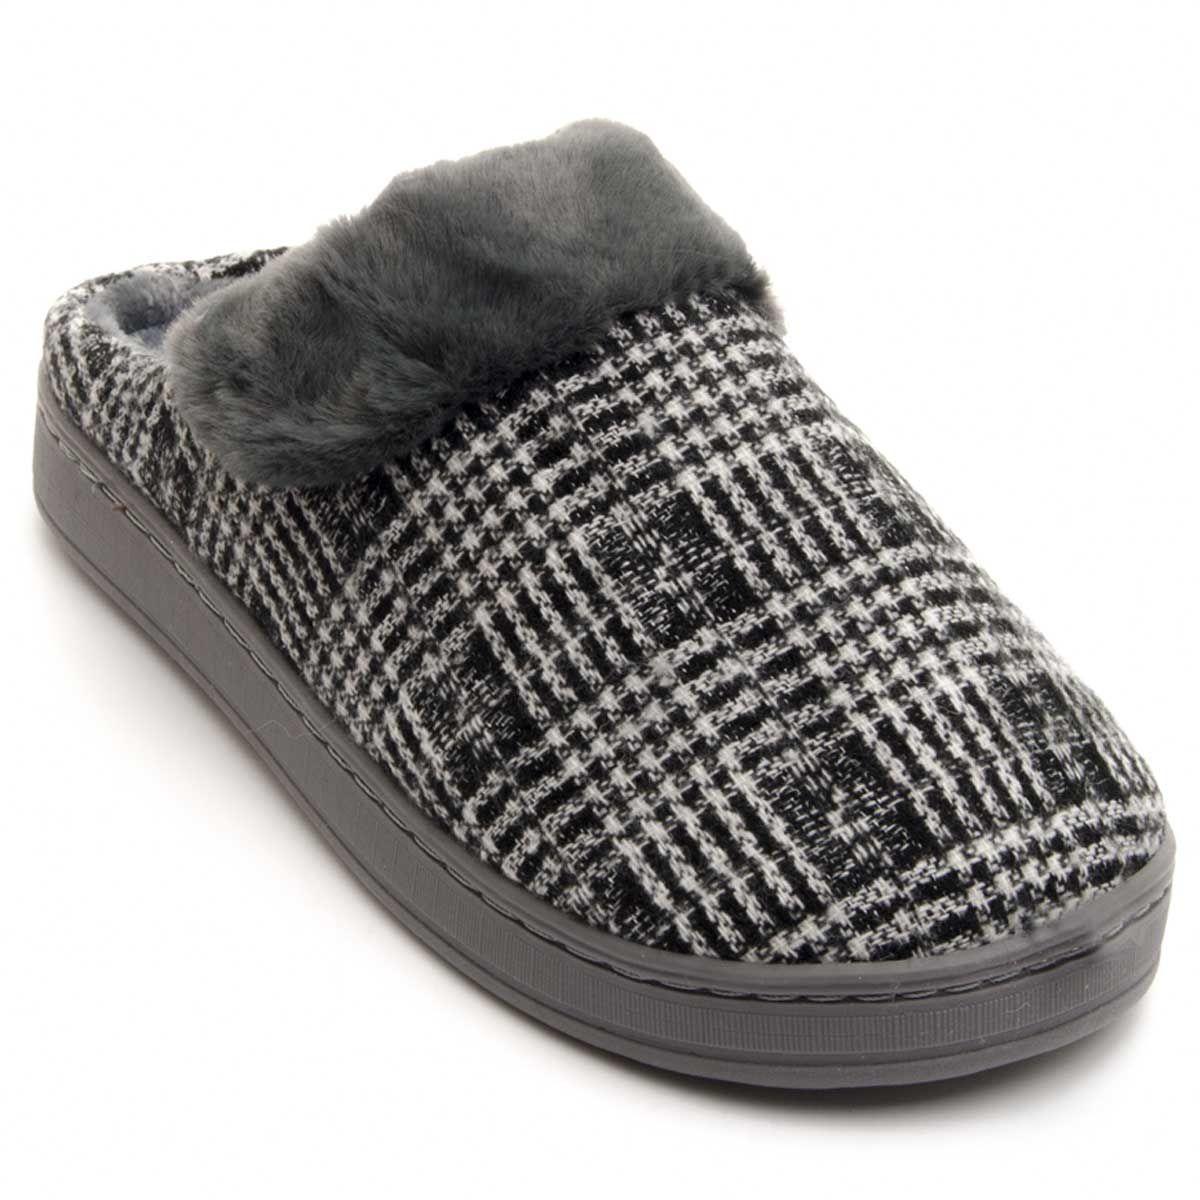 Montevita Comfortable Slipper in Grey